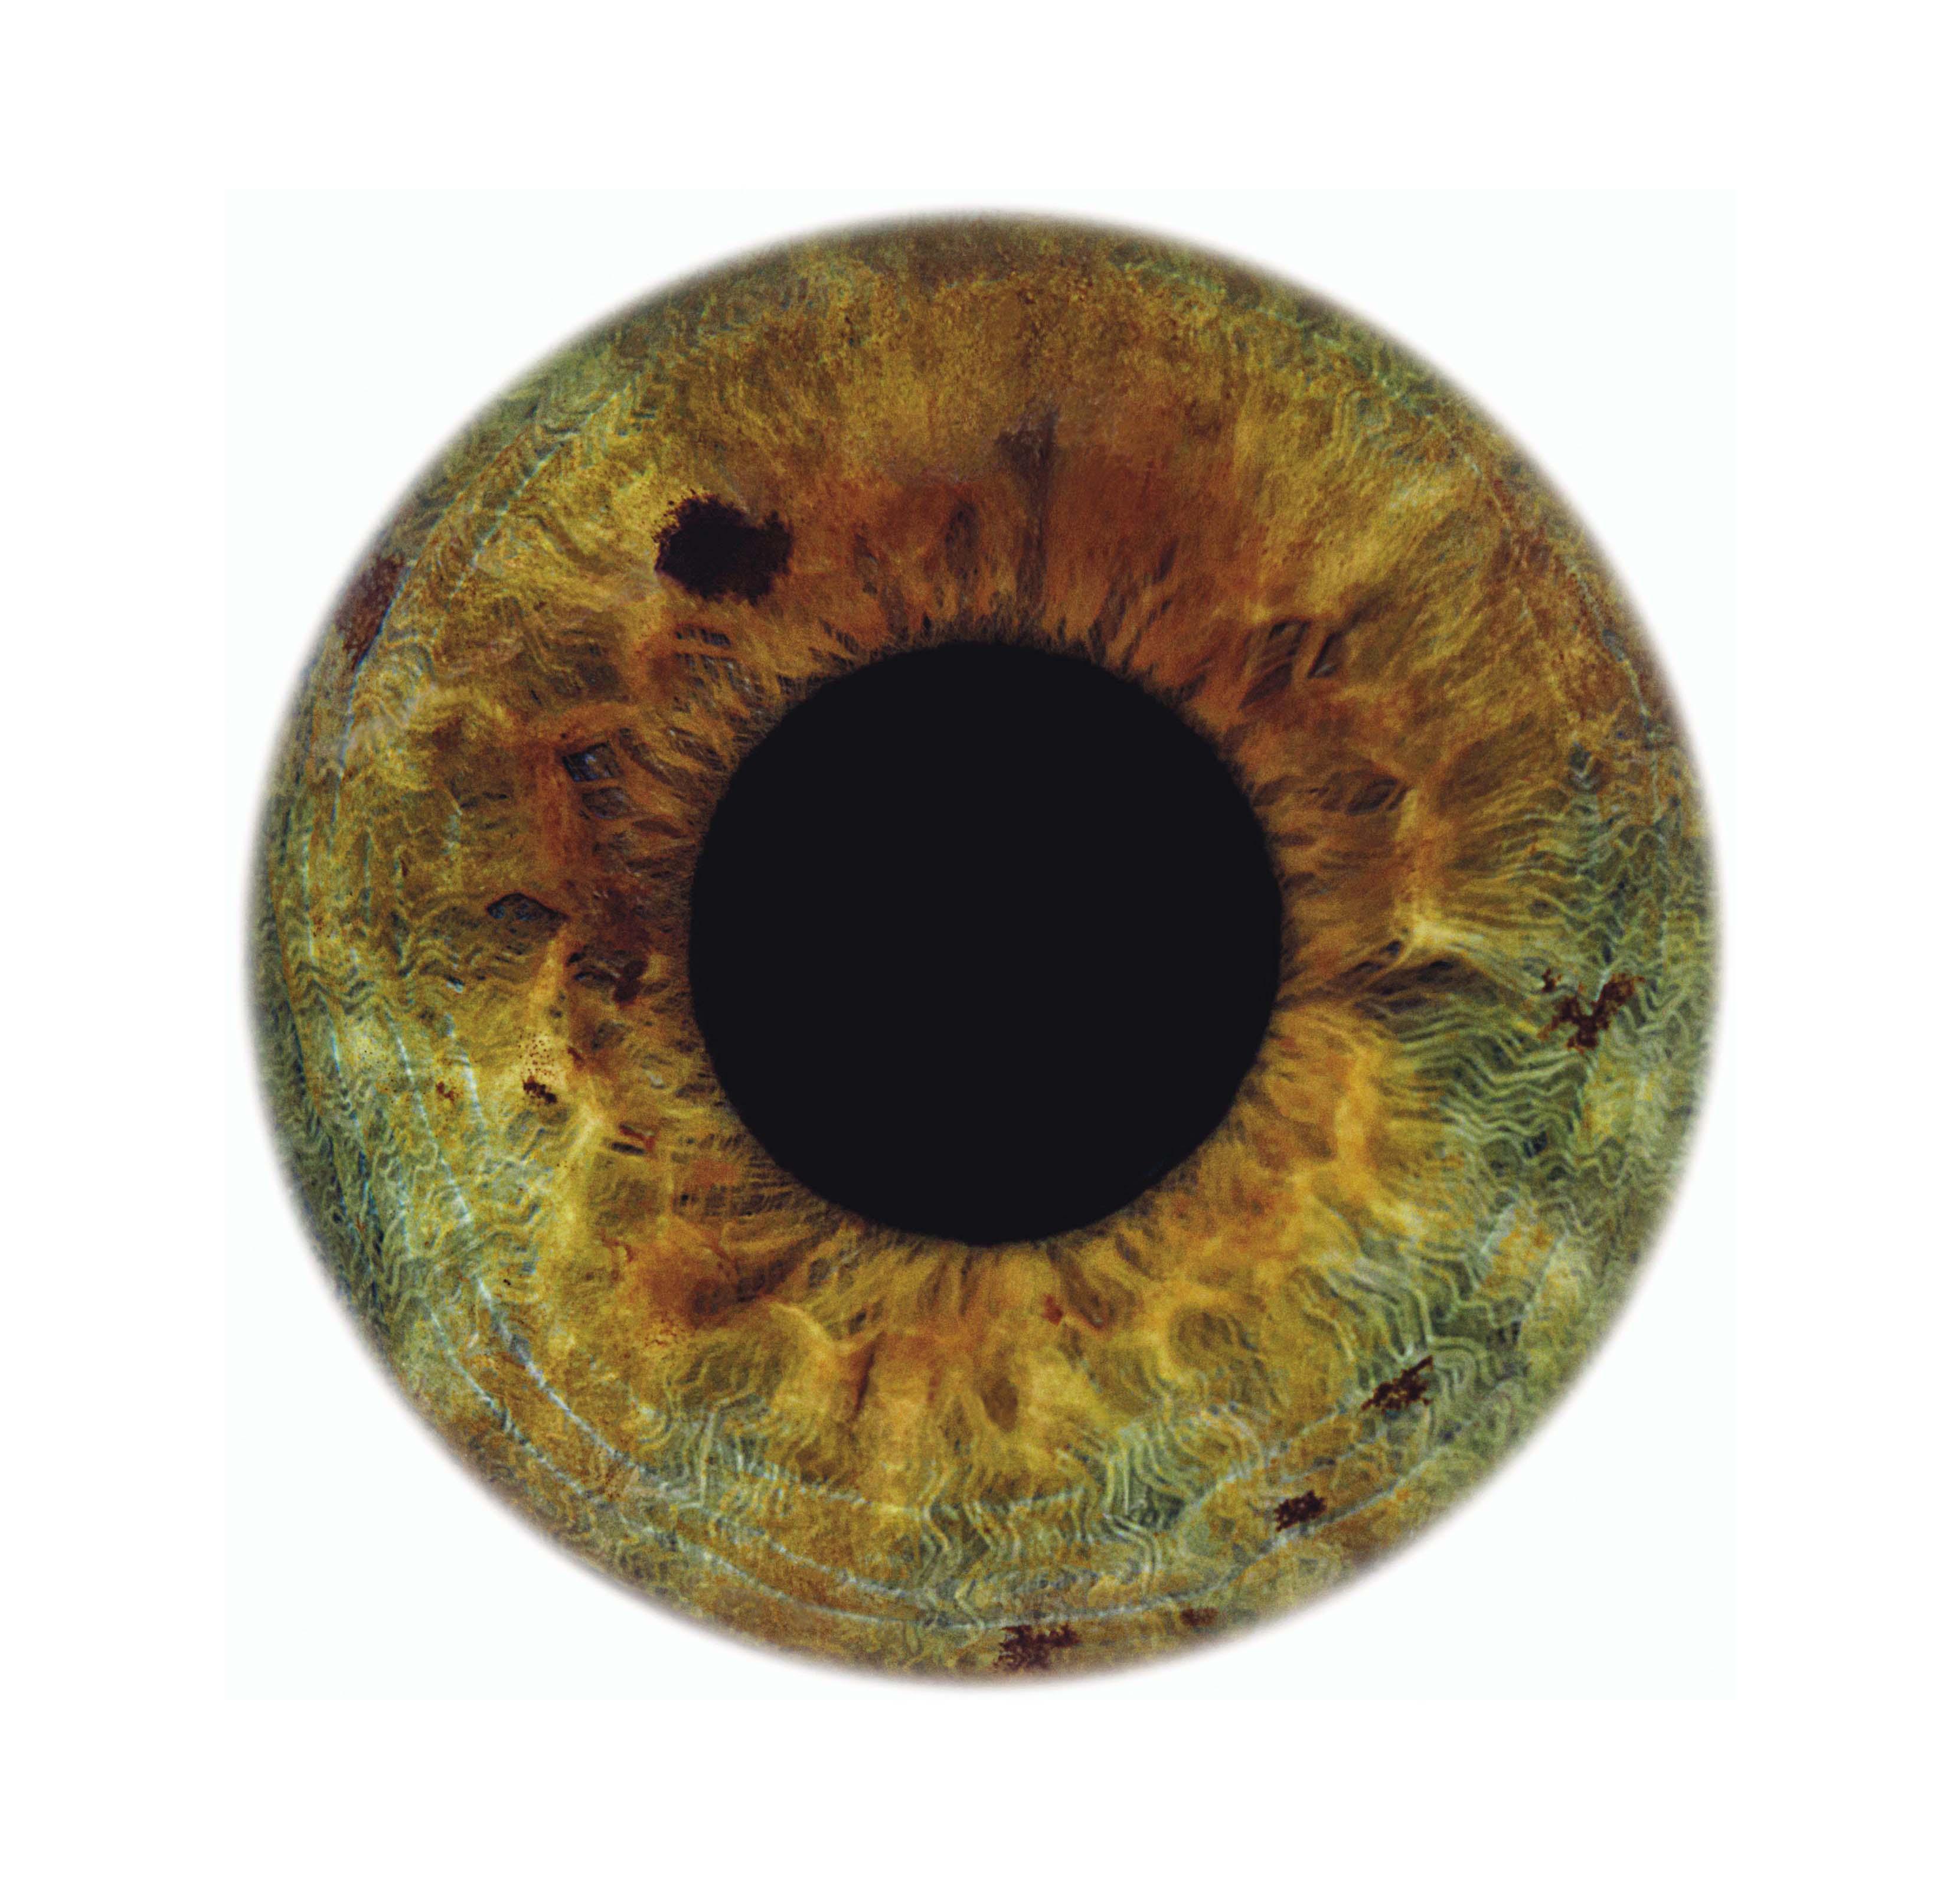 Eyescape Kate, 2012